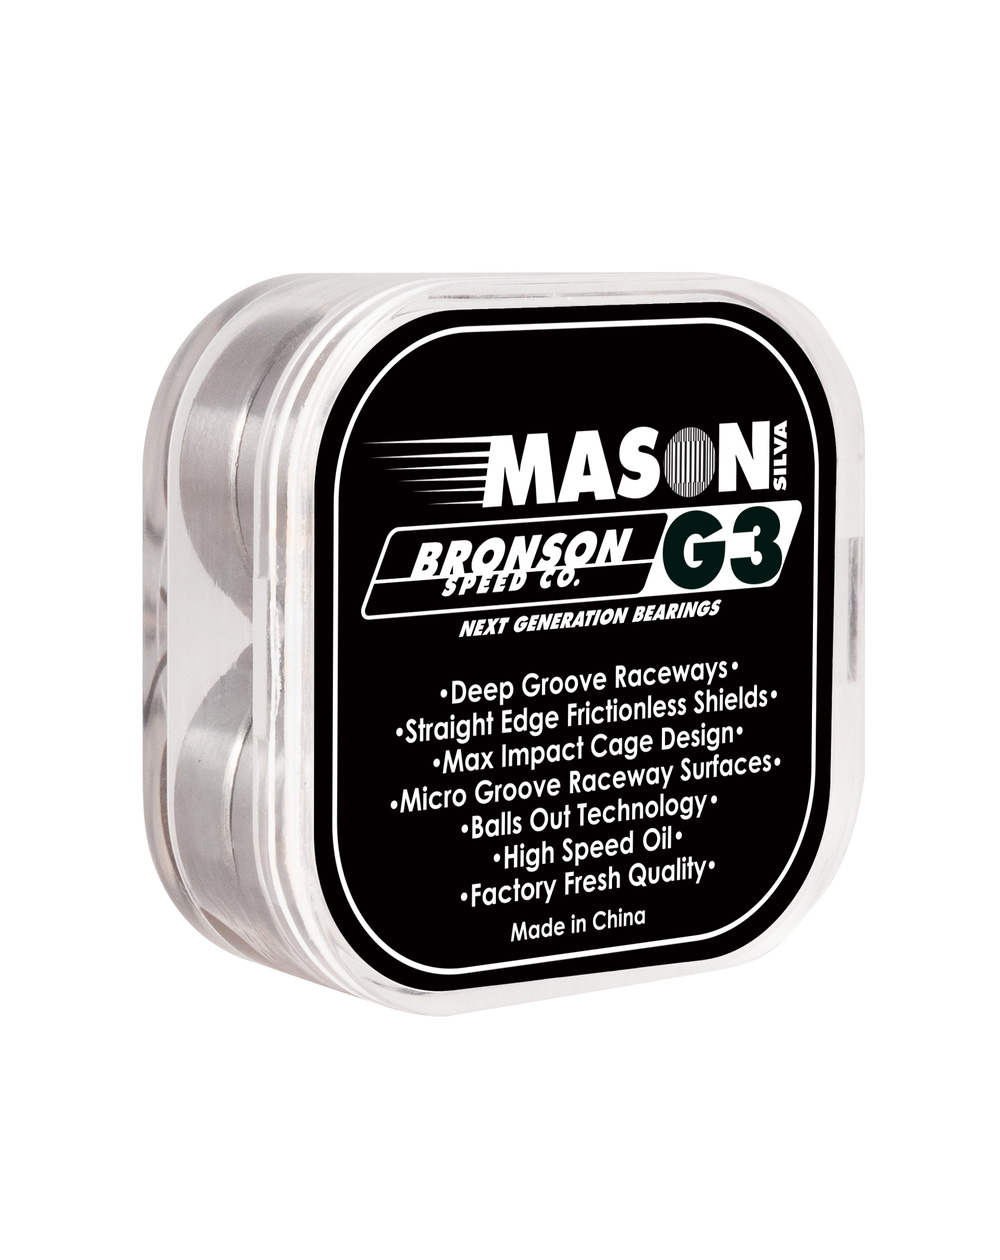 Bronson Speed Co. G3 Pro Mason Silva Skateboard Bearings